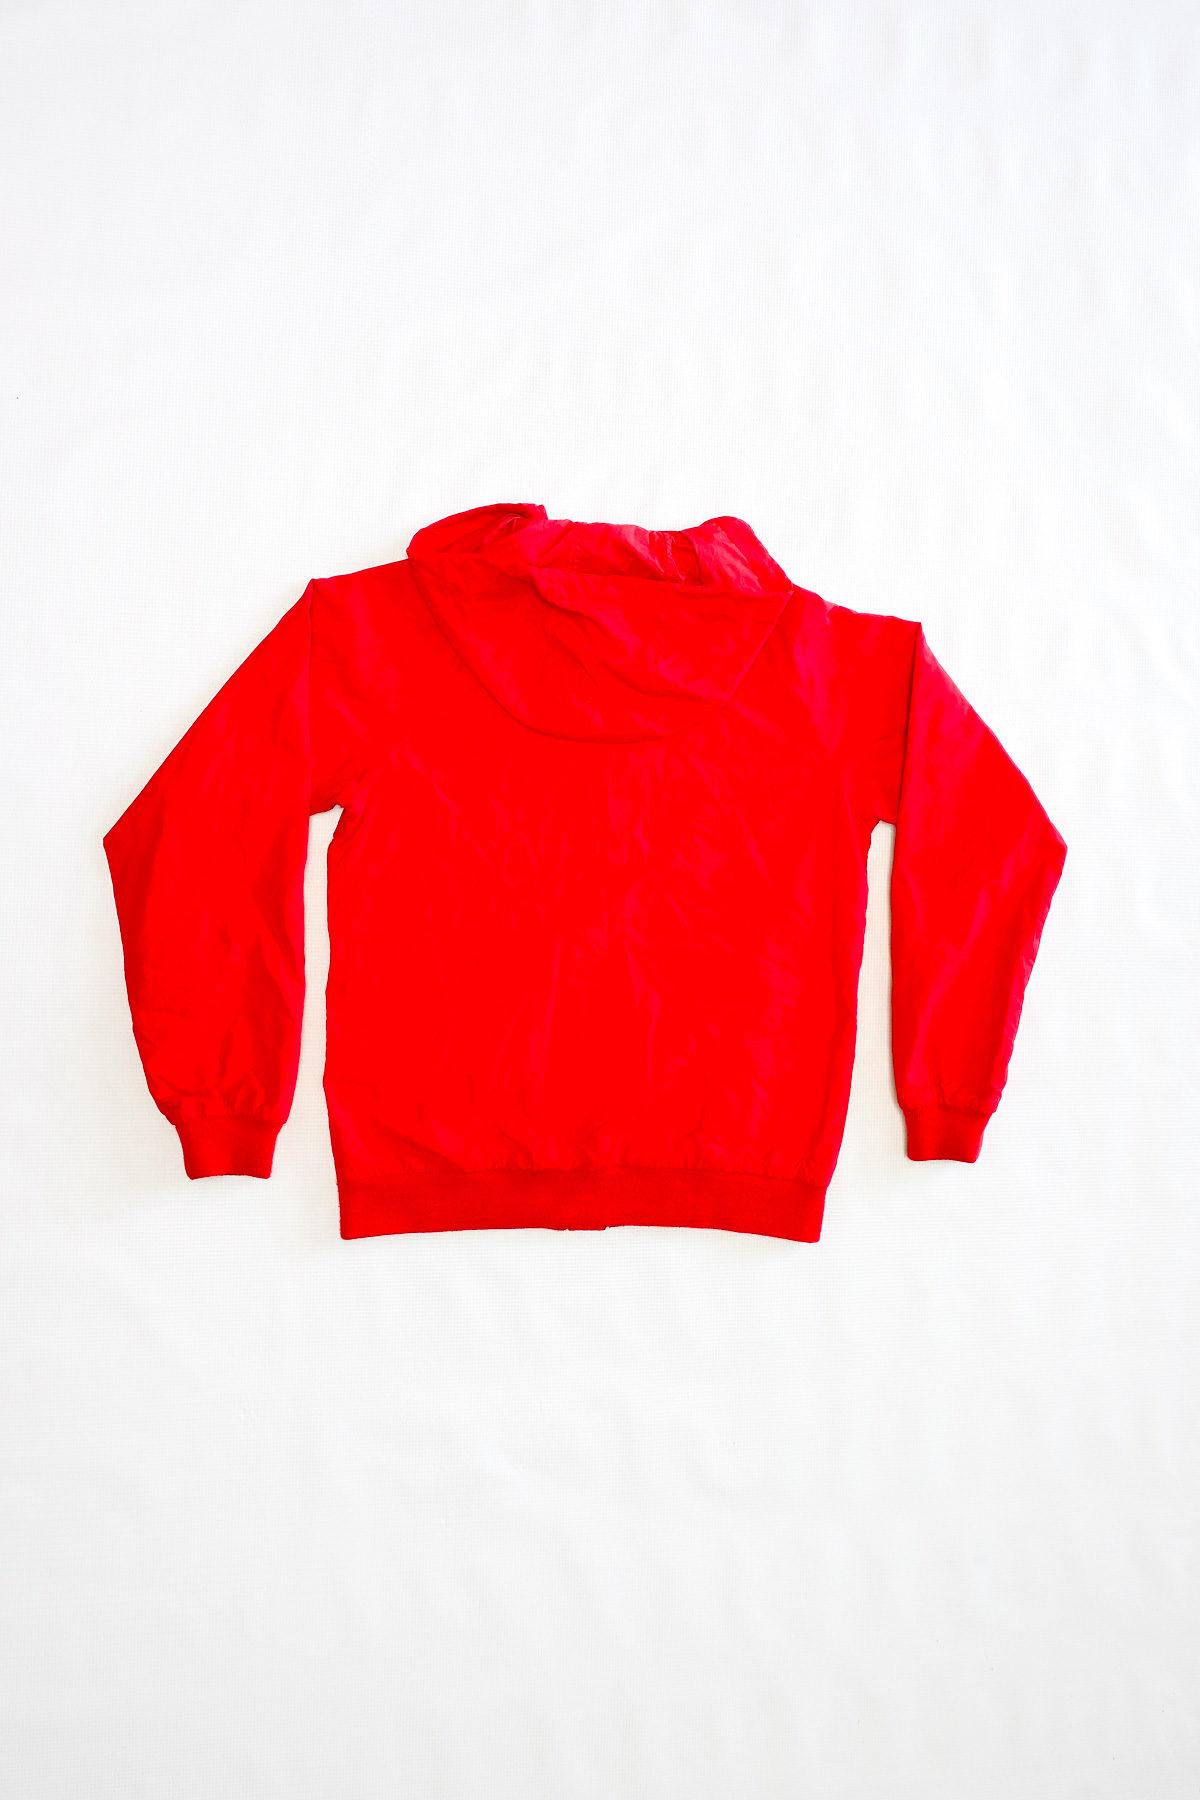 Lacoste GIUBBINO VINTAGE Red